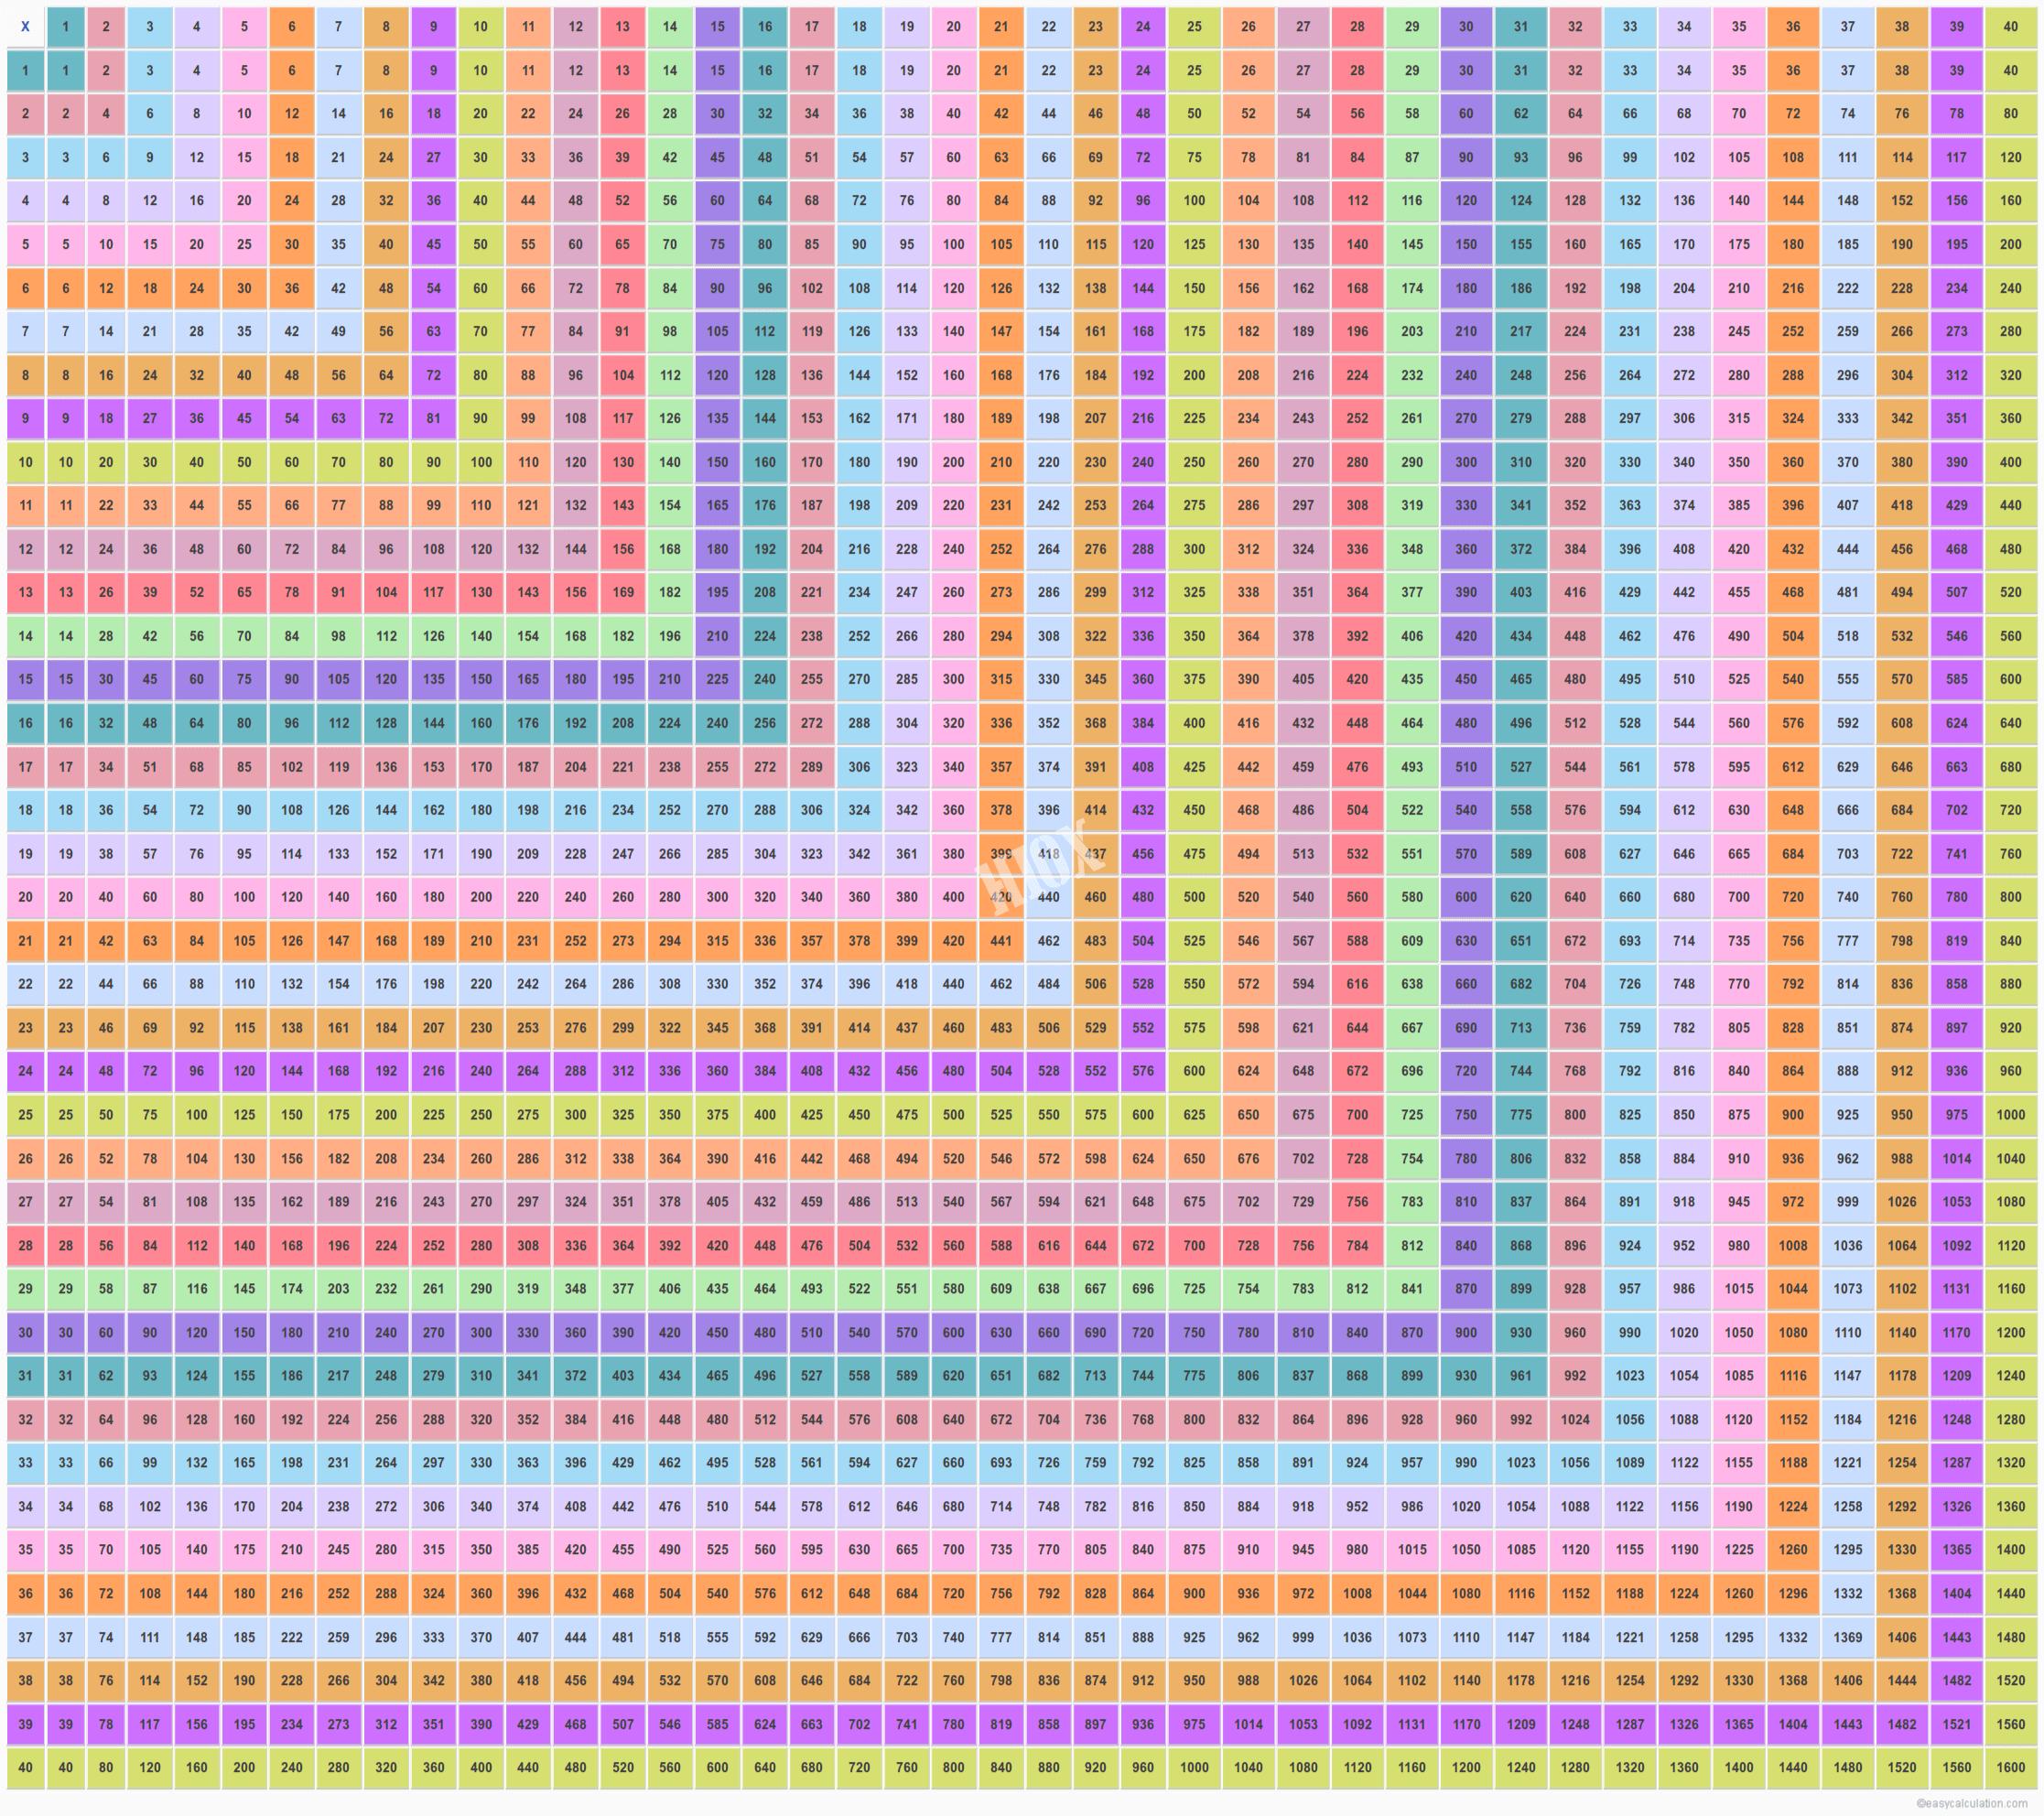 Multiplication Table 40X40 | Multiplication Chart 1 - 40